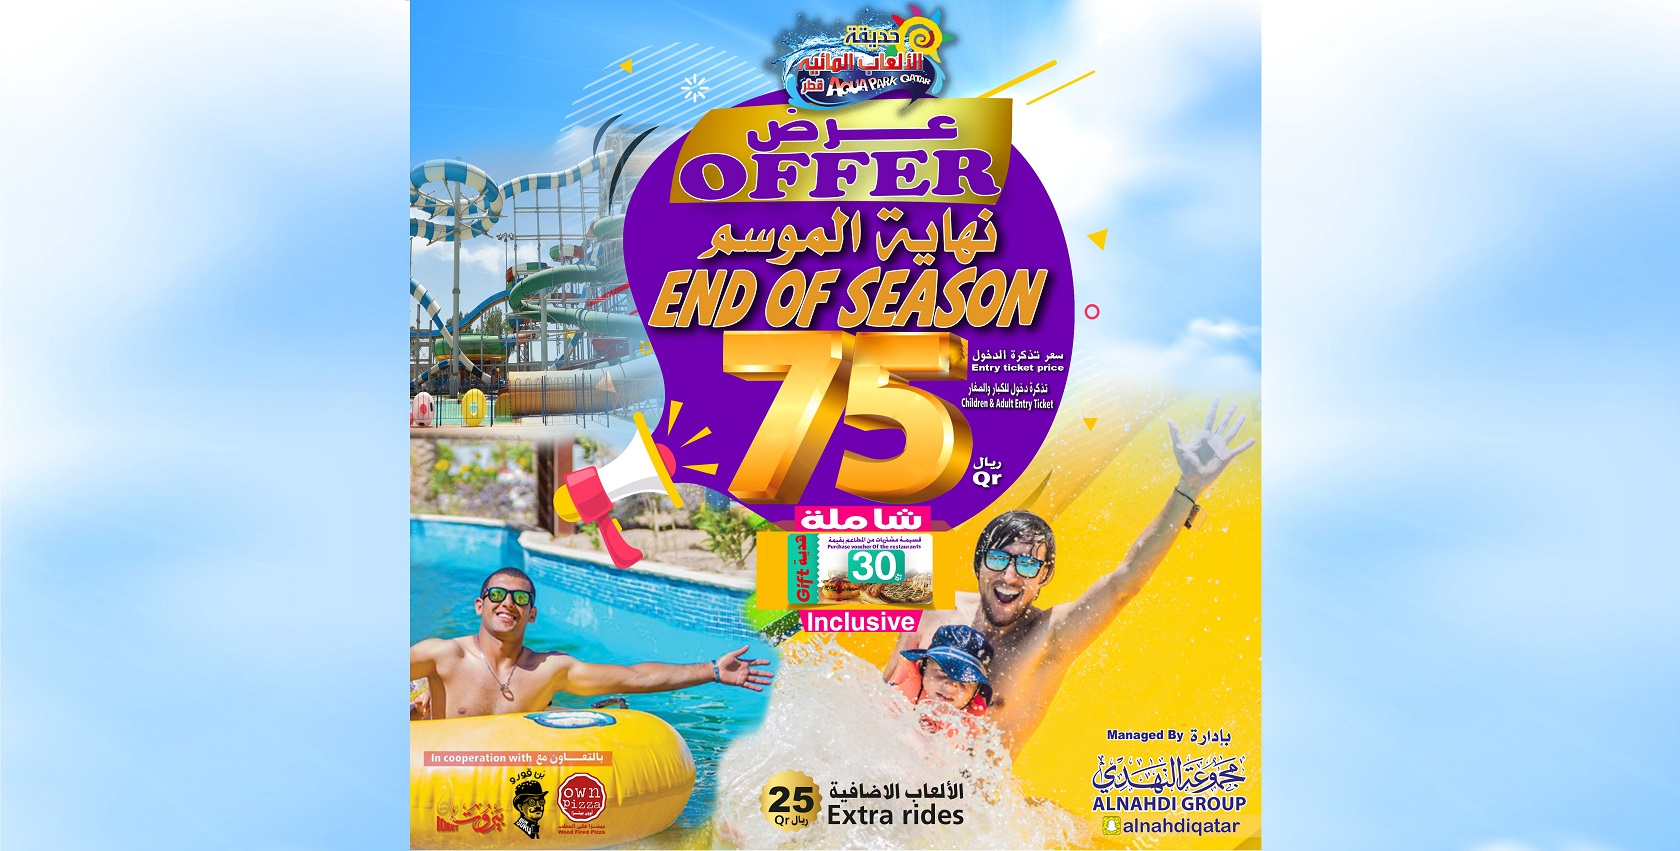 Aqua Park Qatar Offer | Only QR 75 includes QR 30 meal voucher - Nov 2019